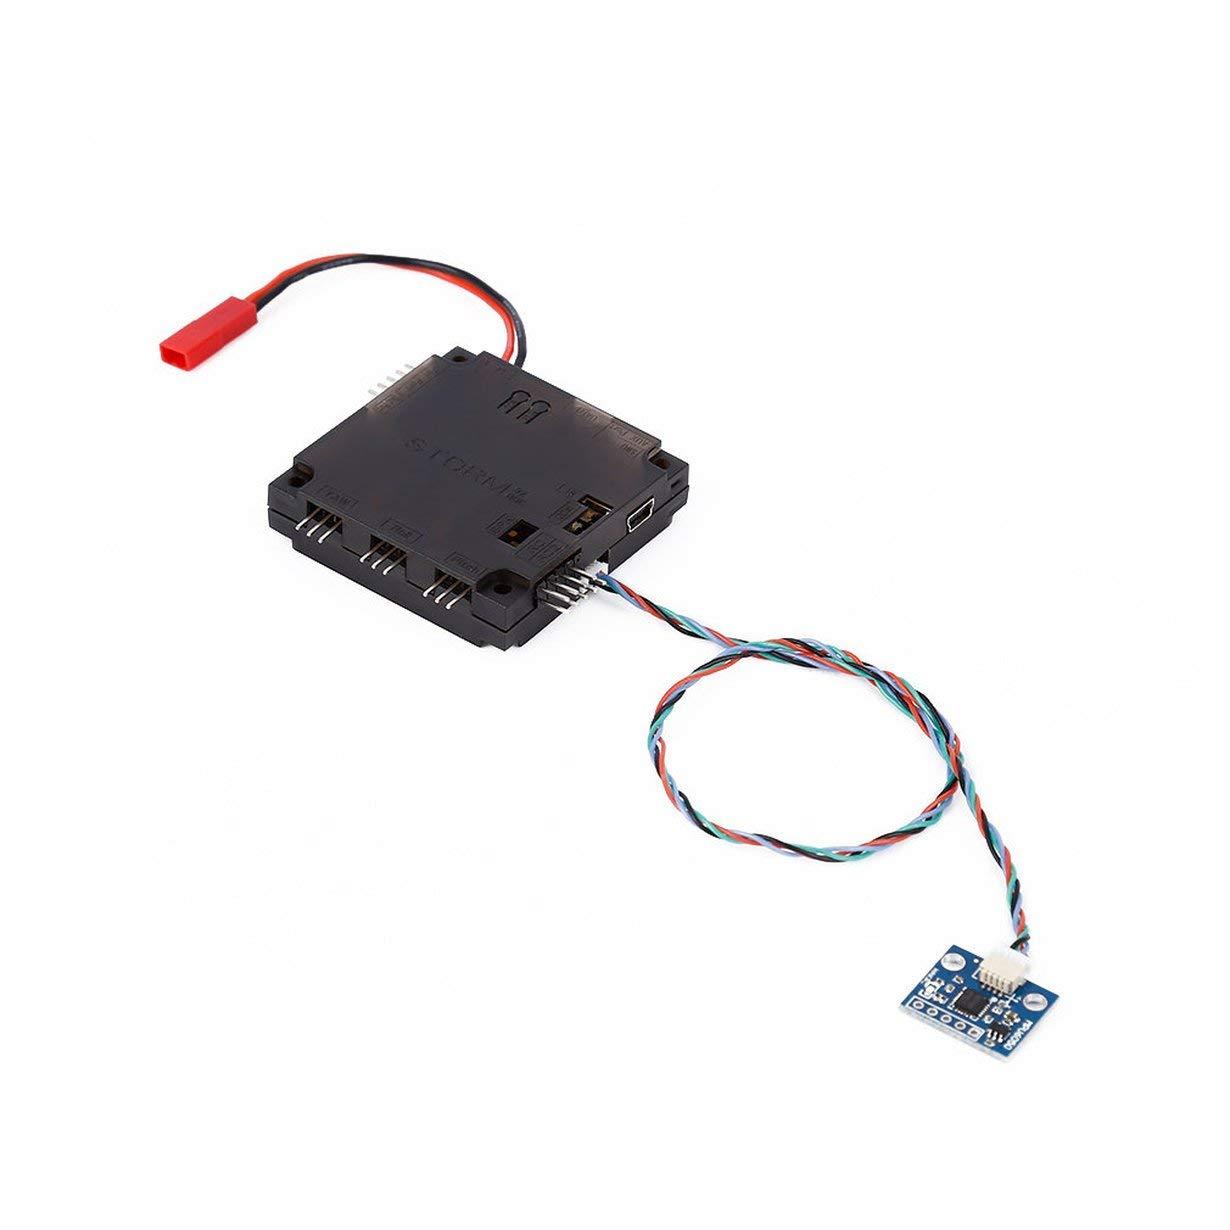 Controlador de cardá n Strom32 de 3 ejes DRV8313, Storm32 BGC 32Bit Controlador de cardá n sin escobillas de 3 ejes V1.31 DRV8313 Controlador de motor Unitedheart